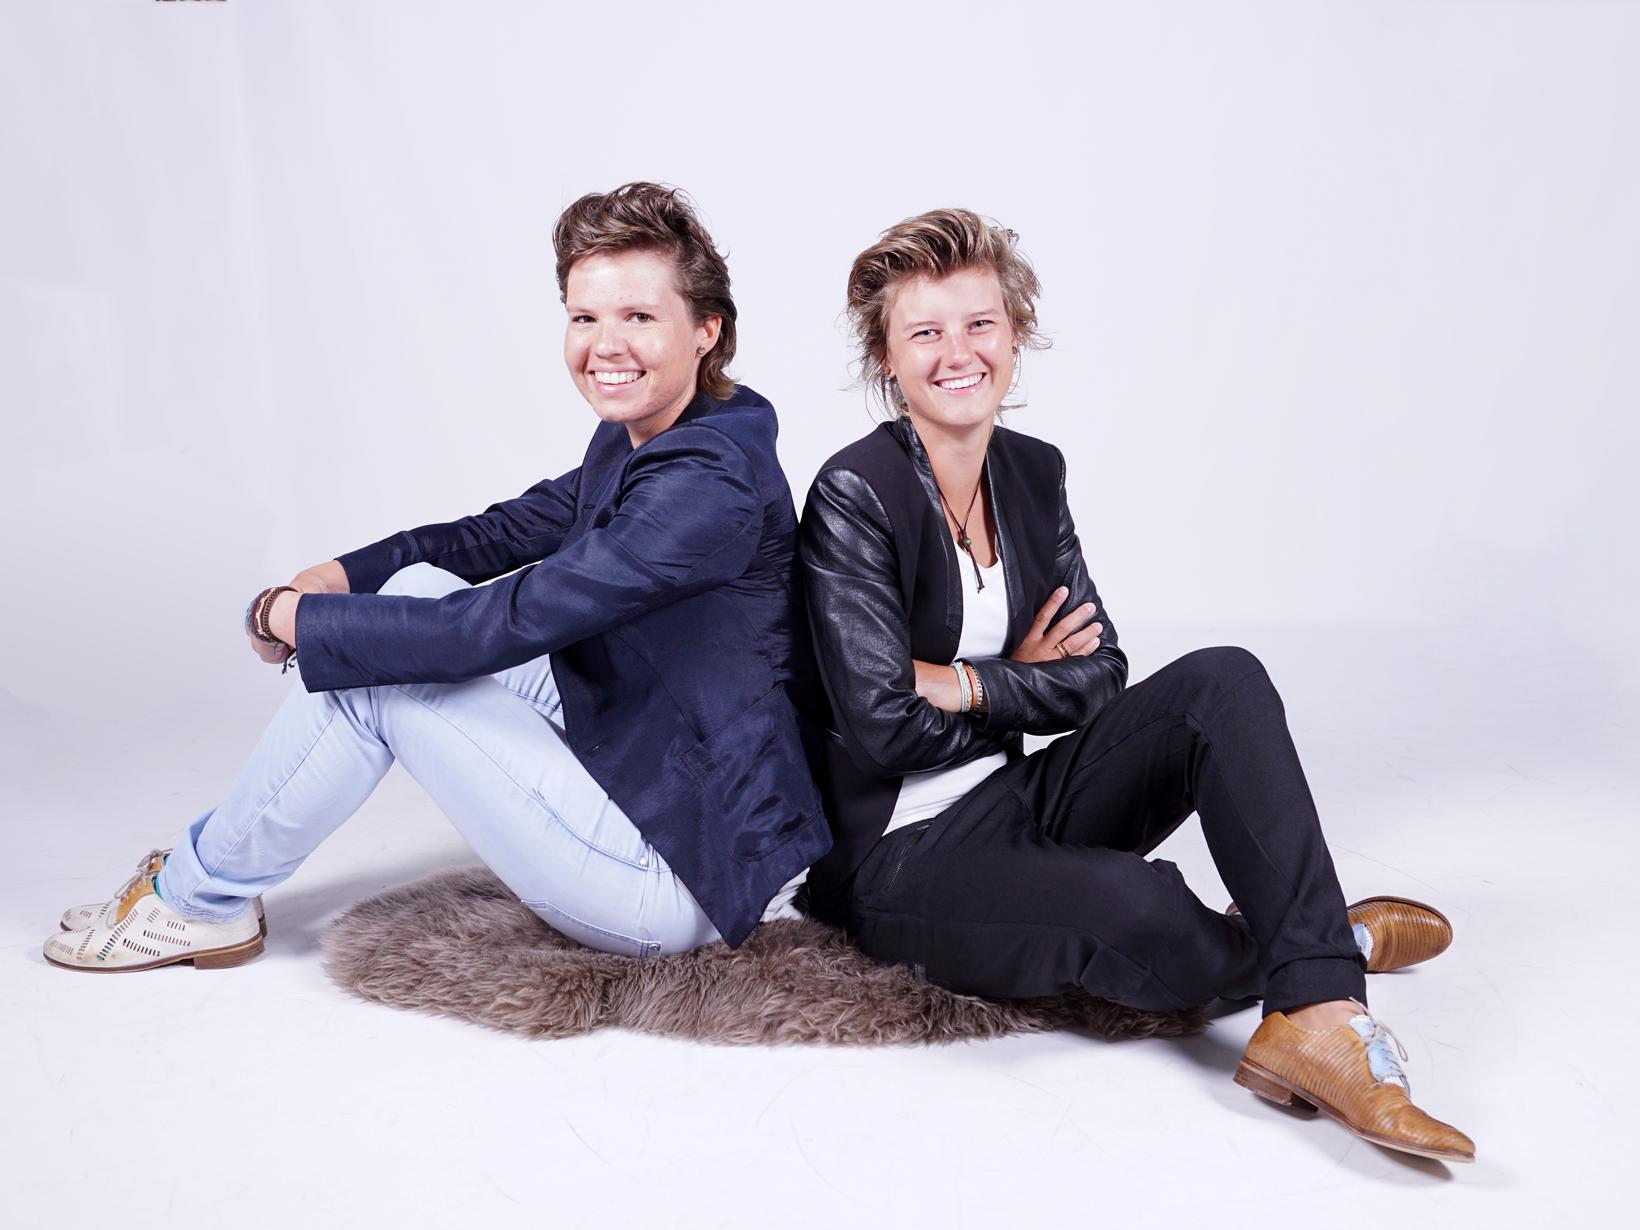 Kell & Nanet from Rotterdam, Netherlands